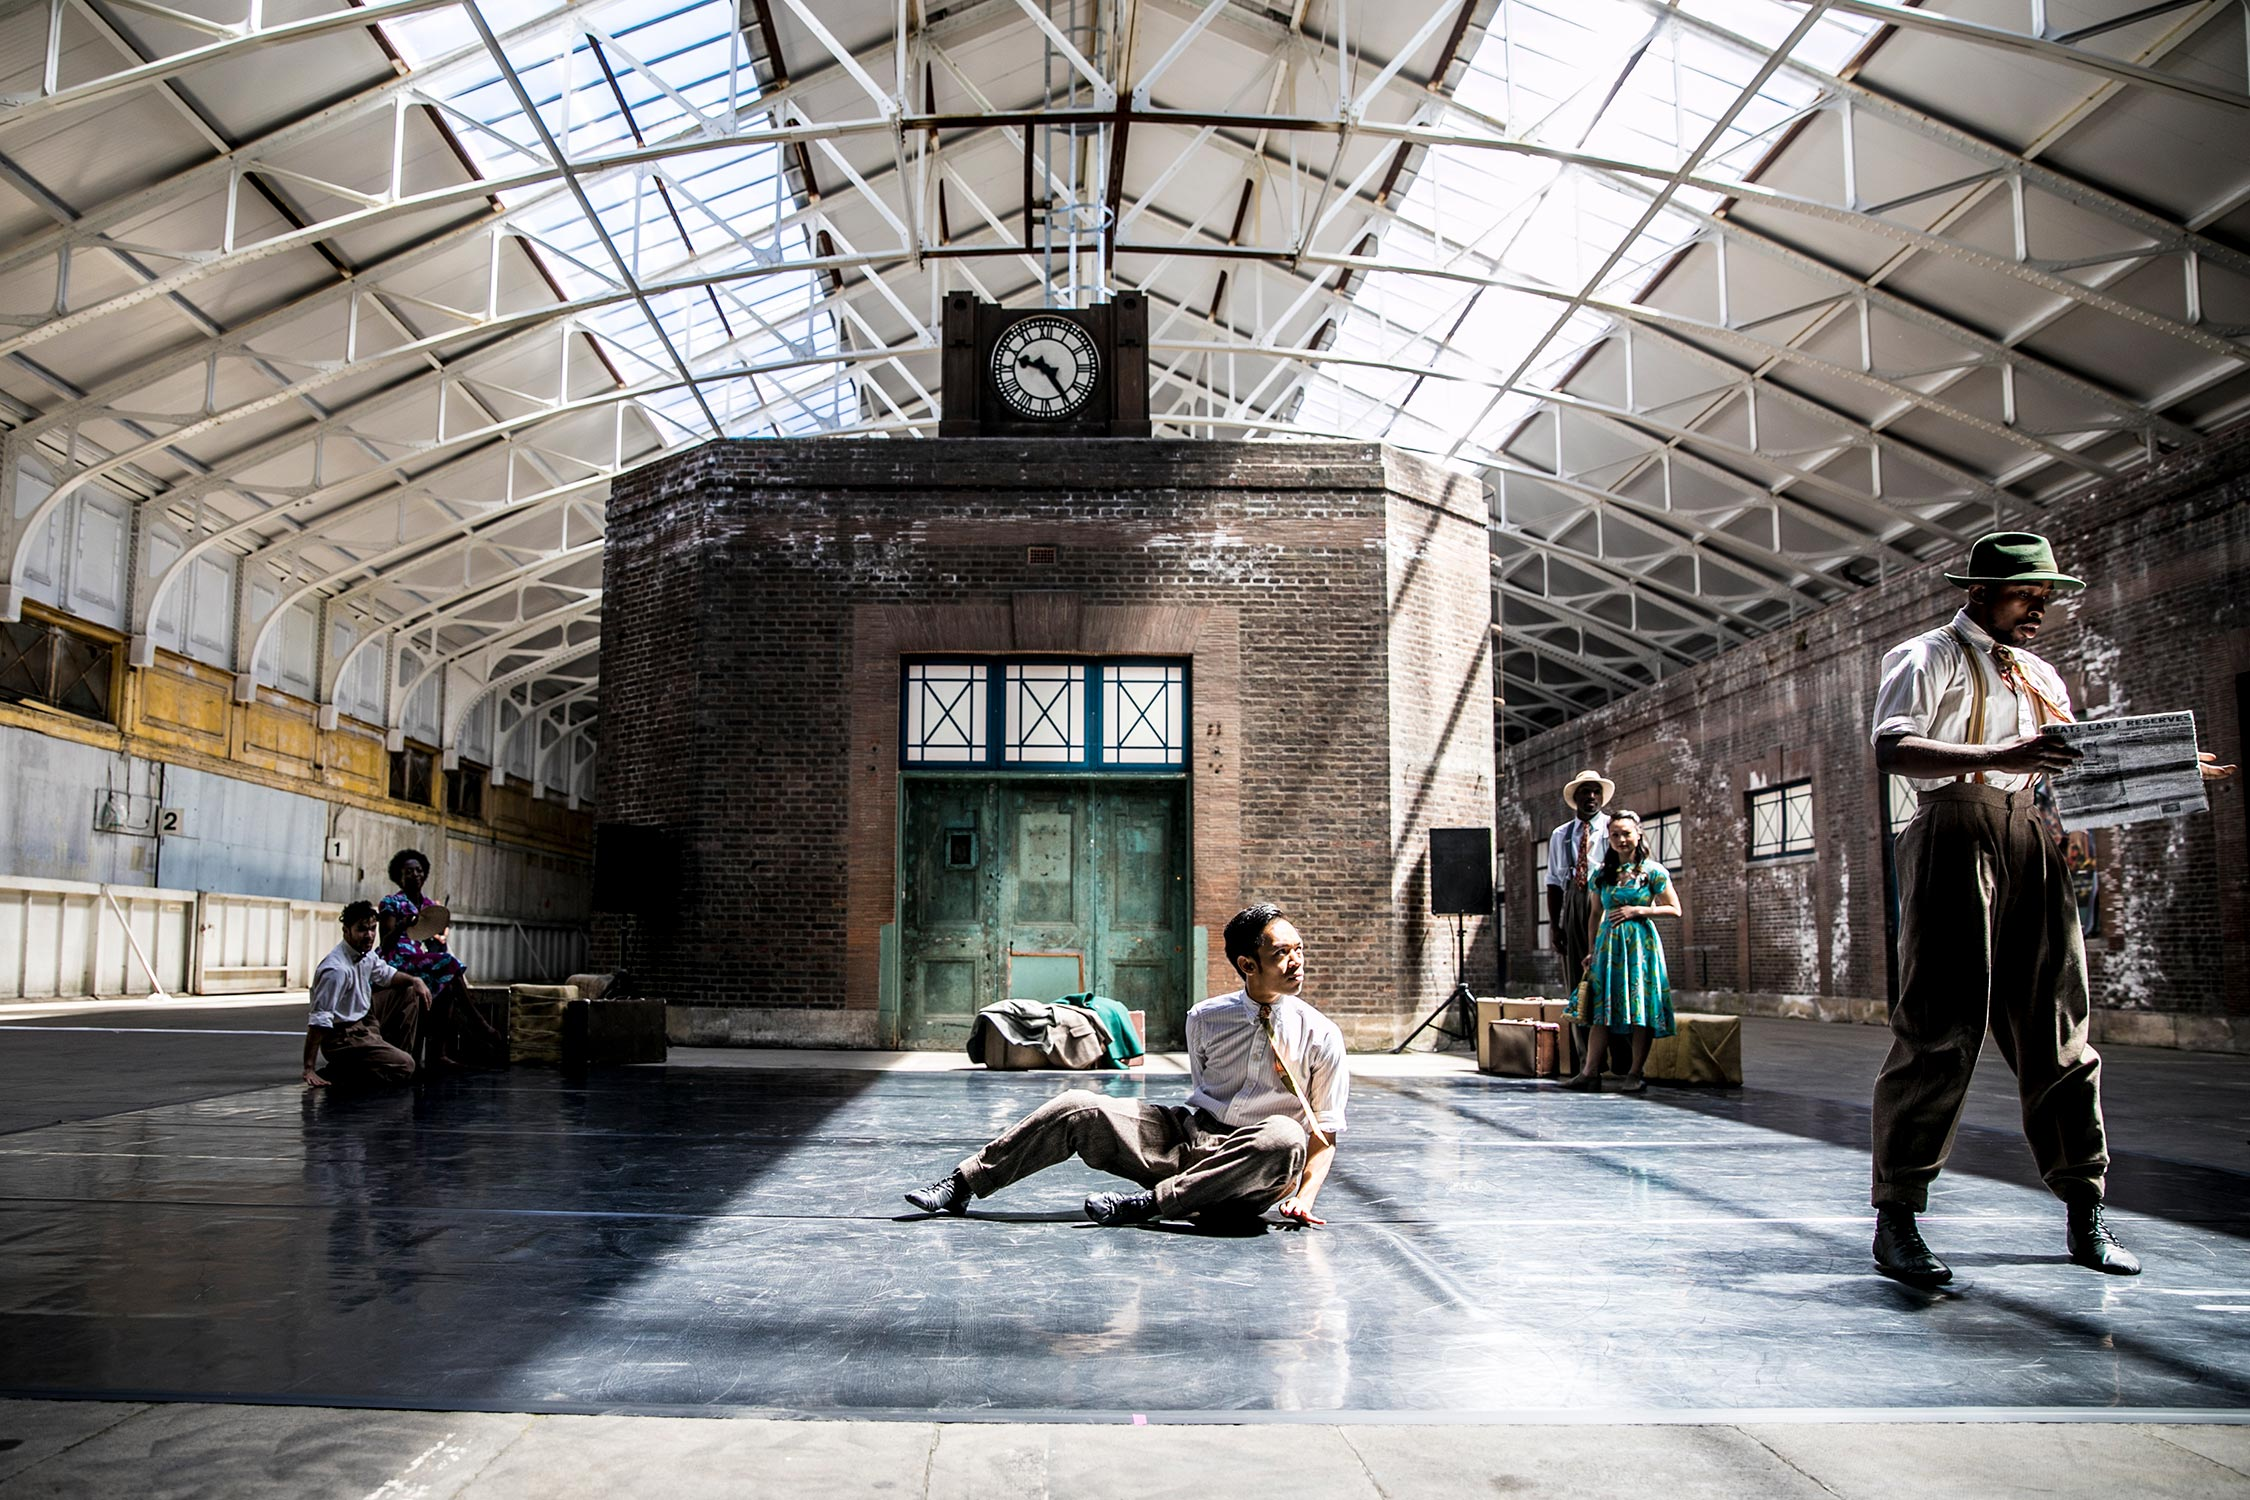 The Heritage – Tilbury Riverside Railway Station